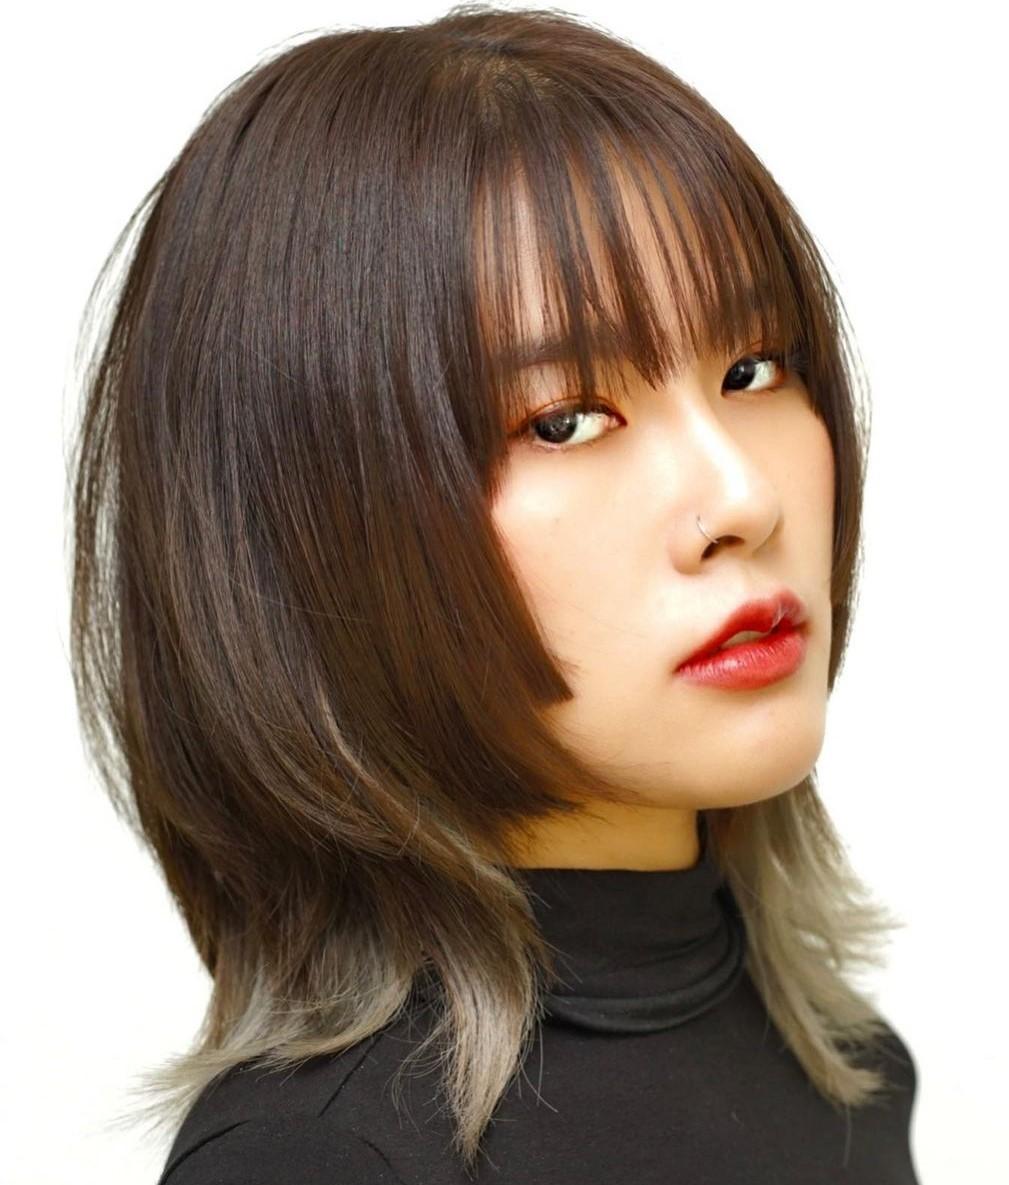 Modern Medium Hair with Bangs and Layers